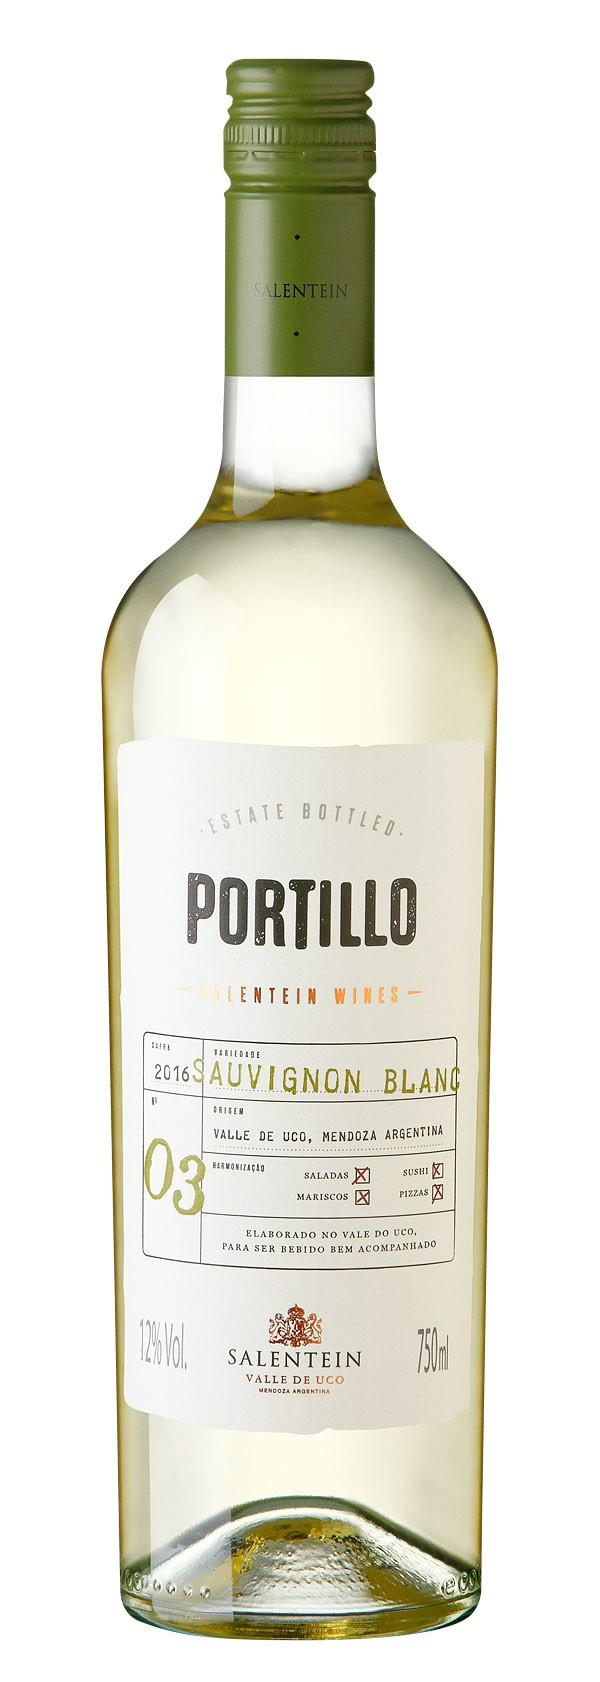 Vinho Salentein Portillo Sauvignon Blanc 2019 Argentina Branco 750ml